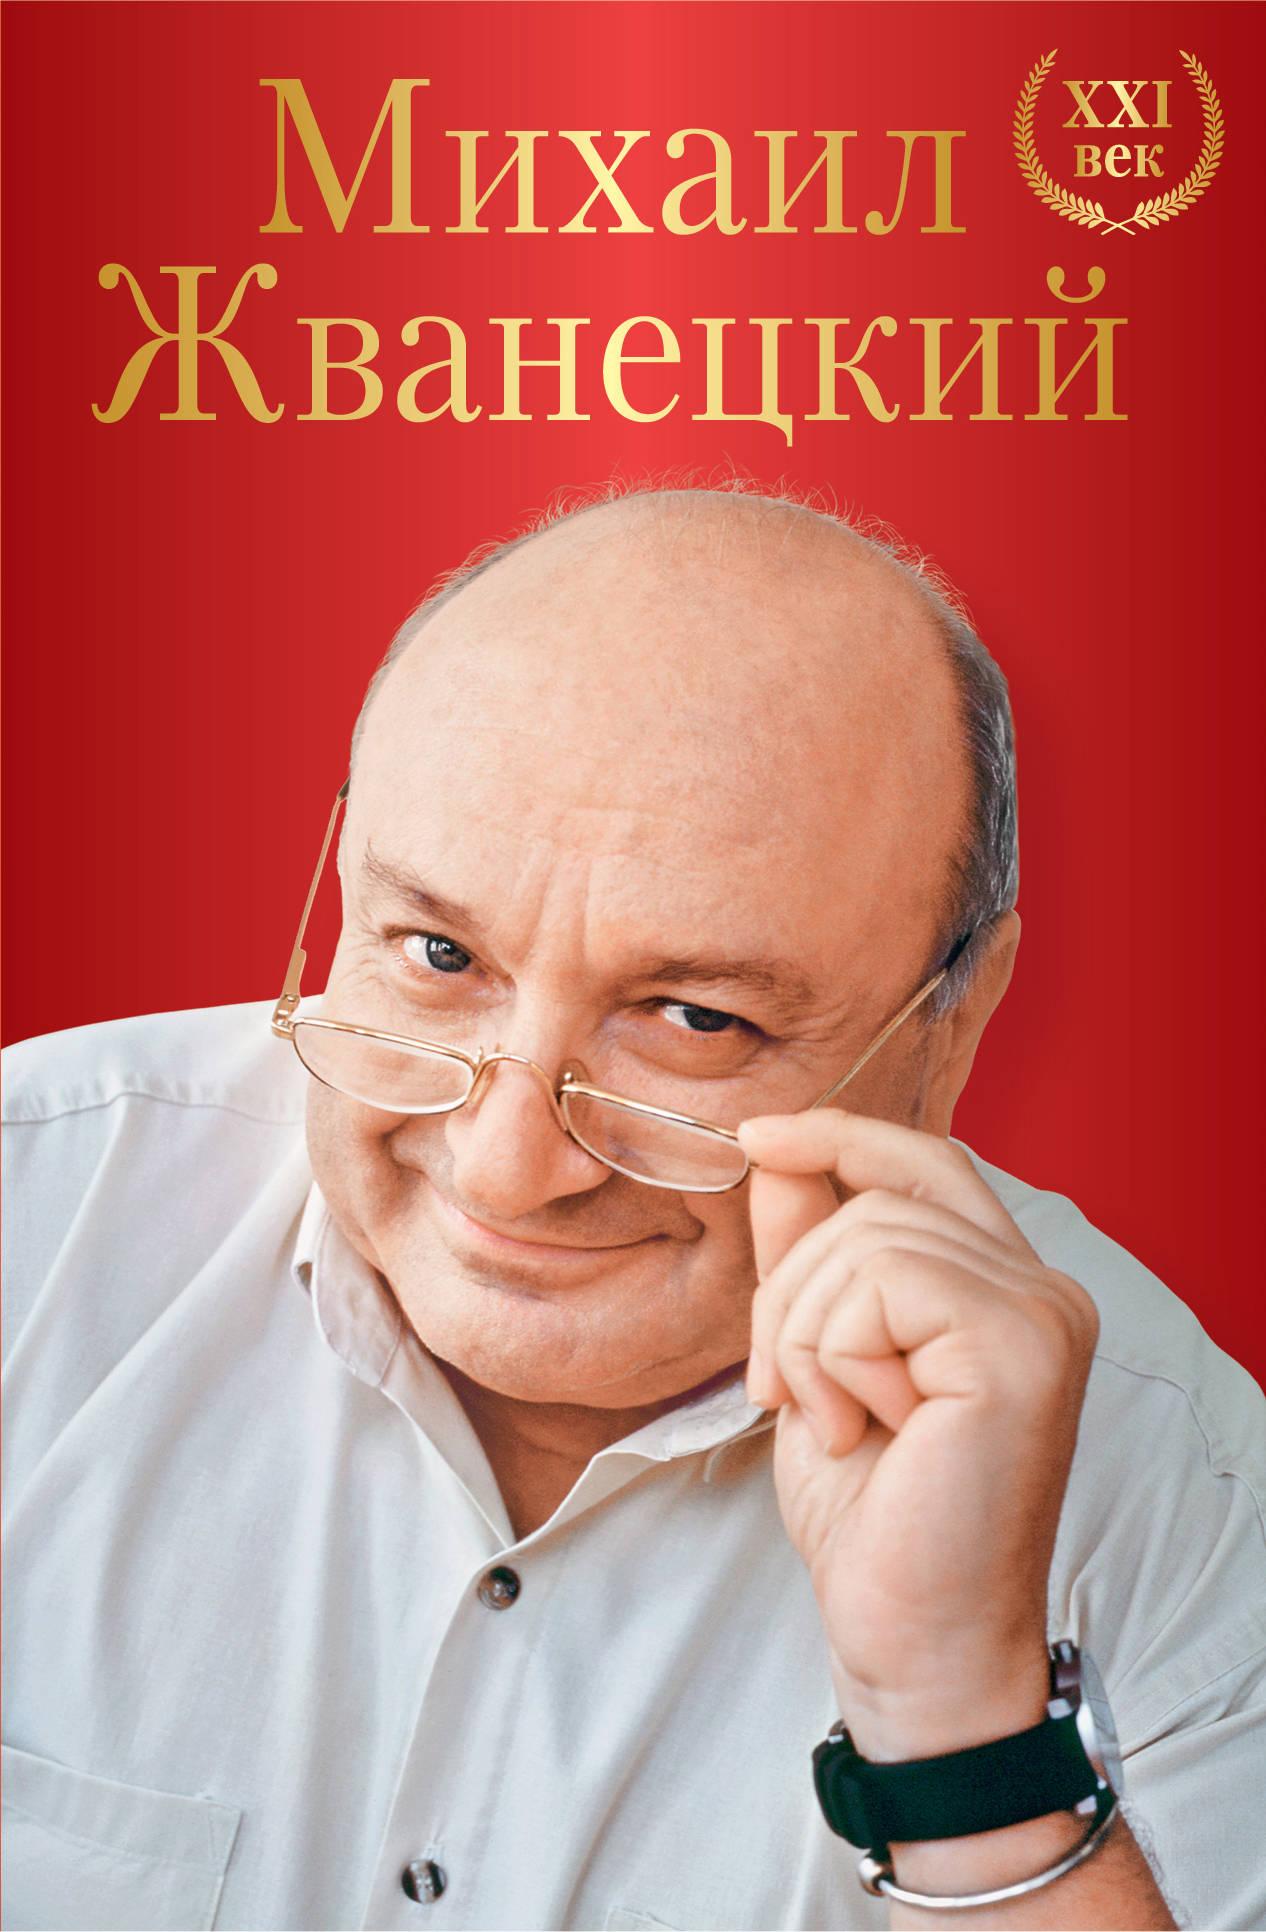 Михаил Жванецкий Михаил Жванецкий. XXI век михаил жванецкий год за два